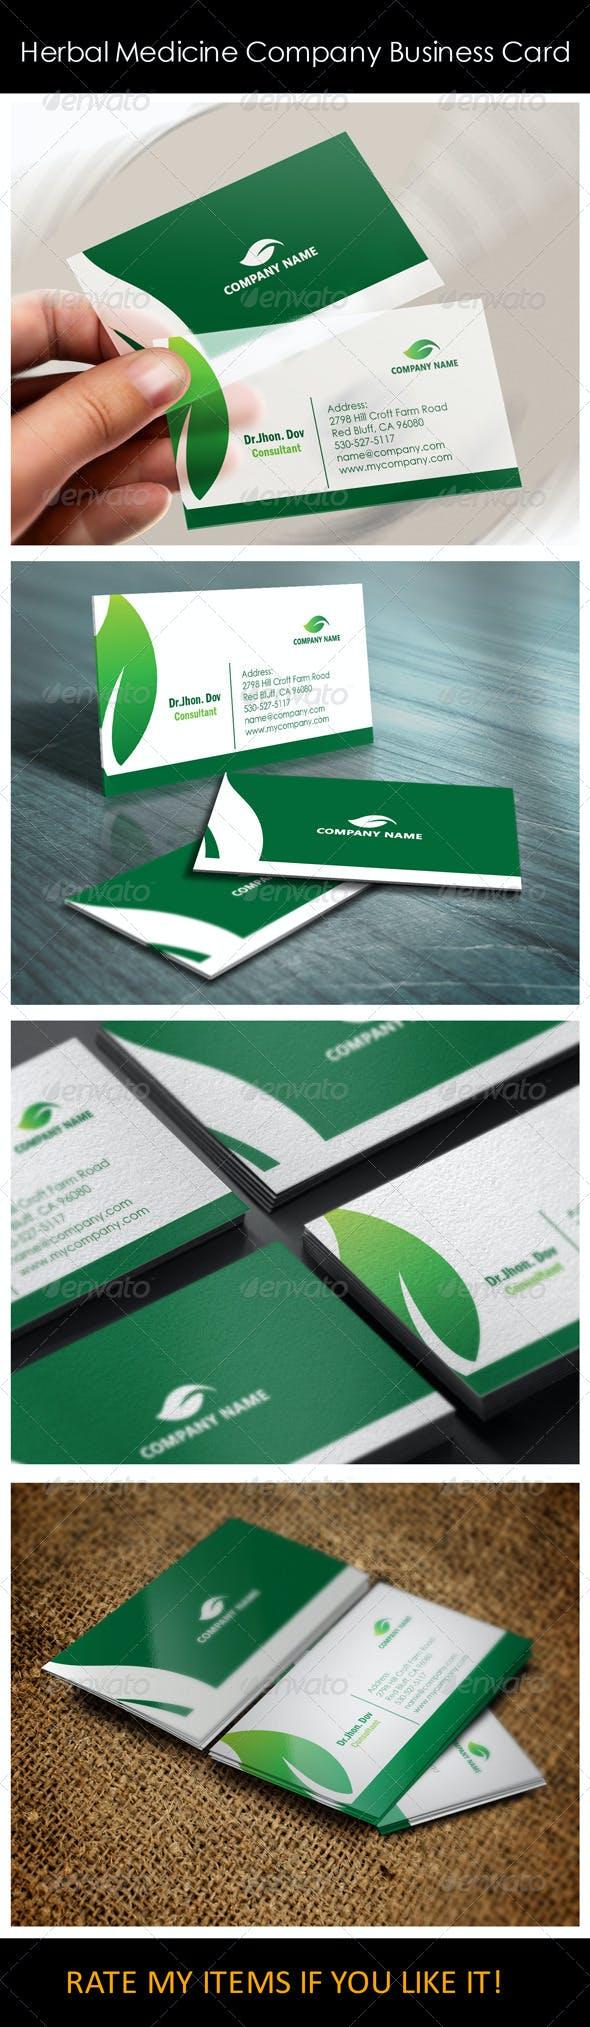 Herbal Medicine Company Business Card Templates By Shujaktk